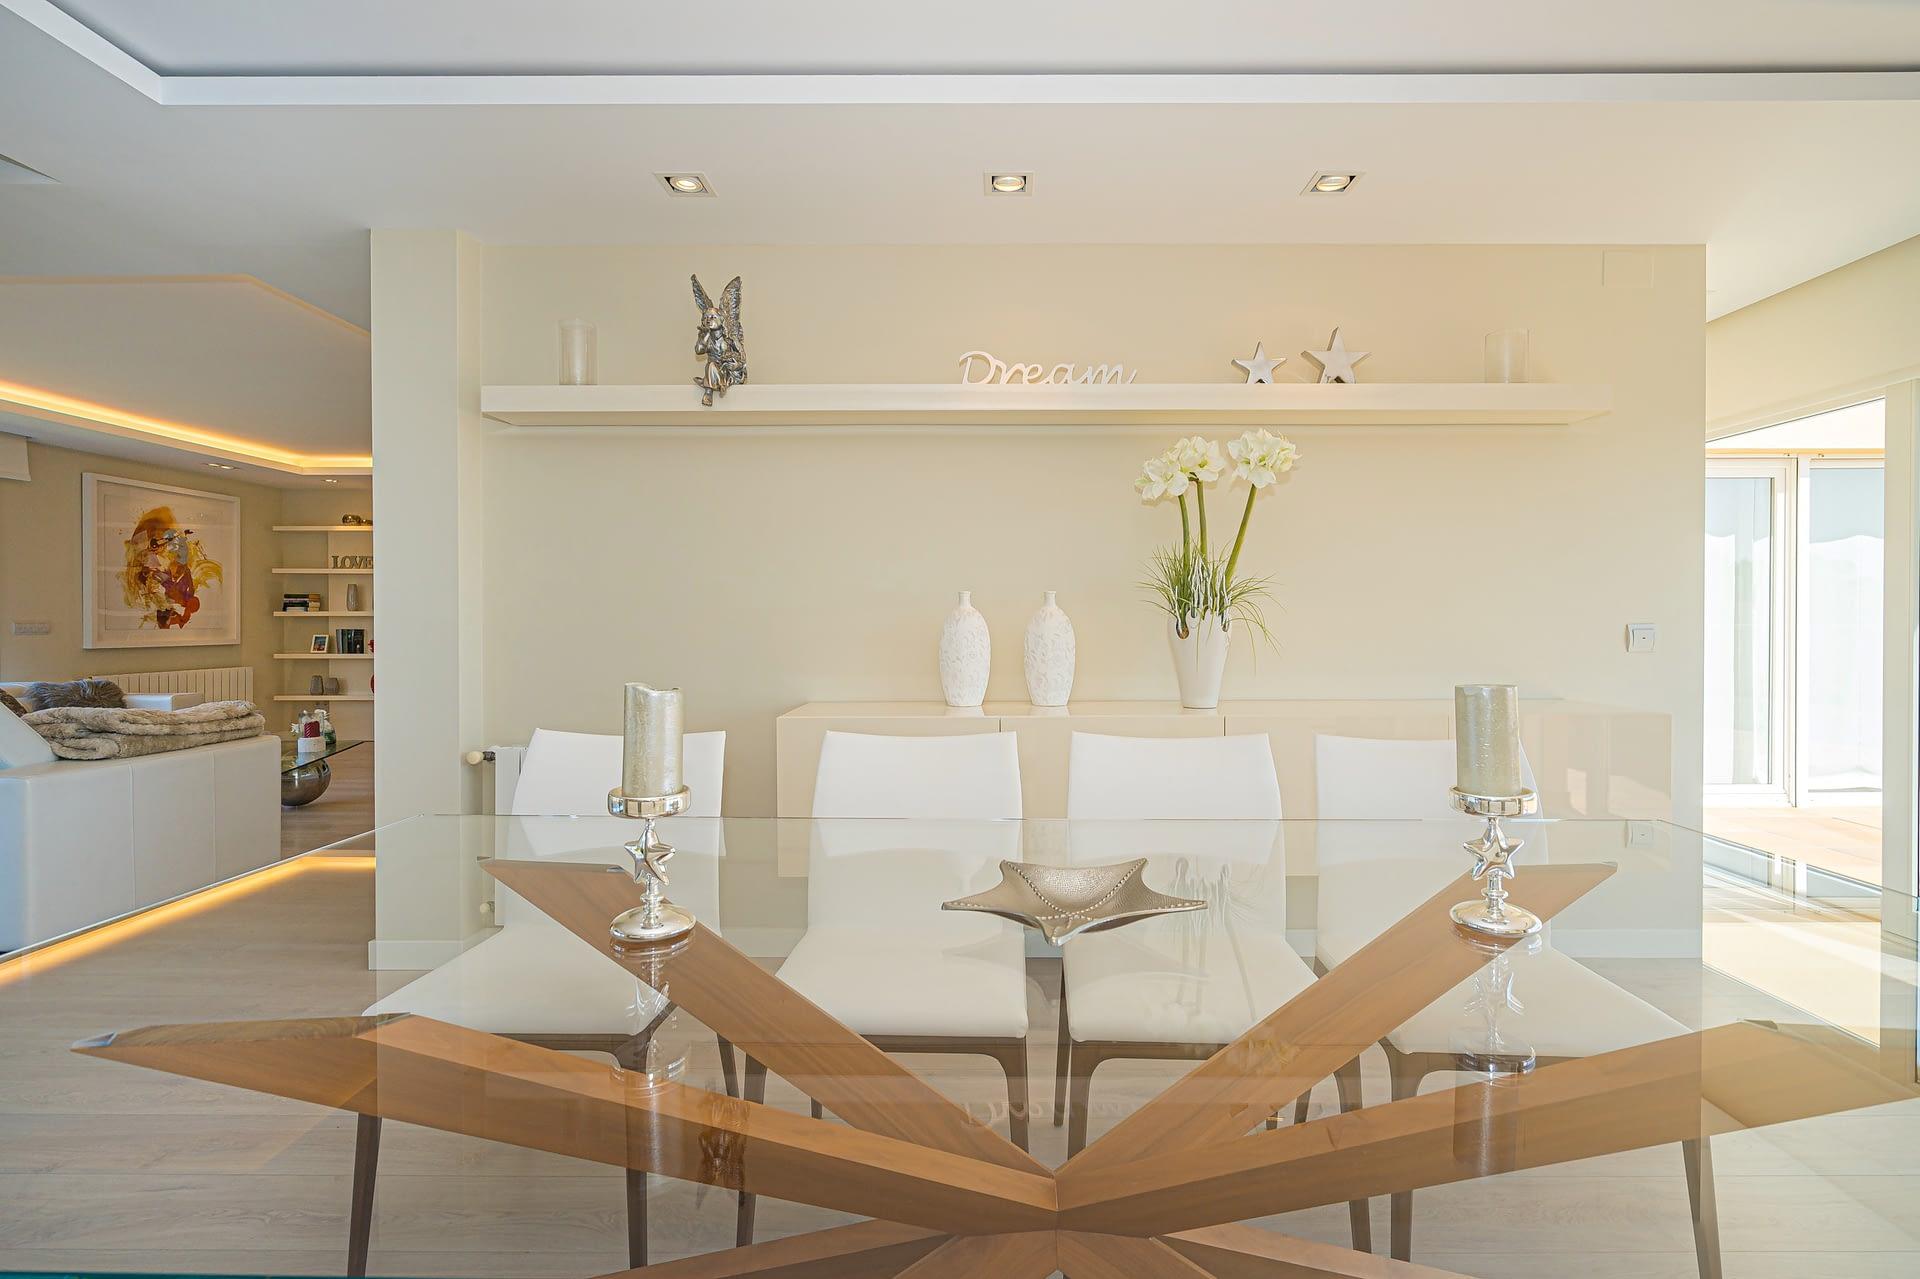 Pierluigi Cavarra - fotografo de Inmobiliaria - real estate photography costa blanca - ejemplo18